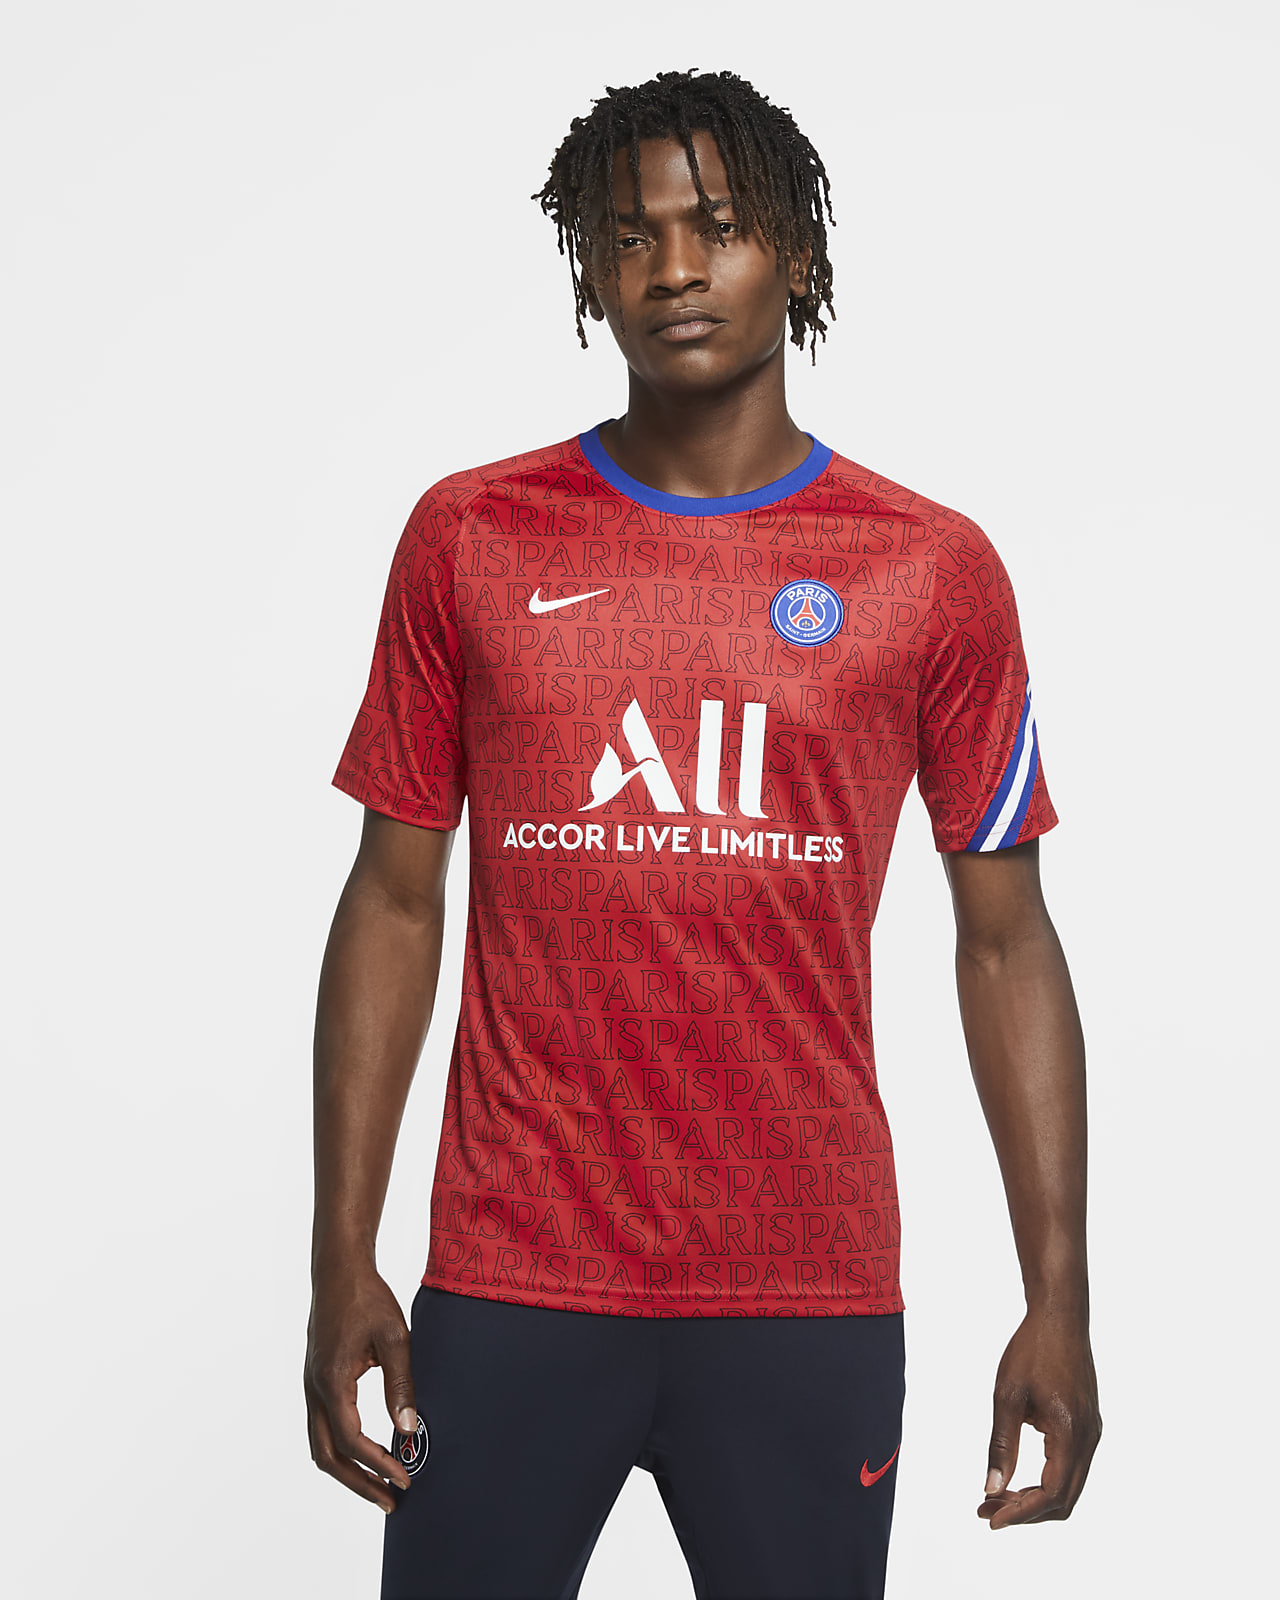 Maglia da calcio a manica corta Paris Saint-Germain - Uomo